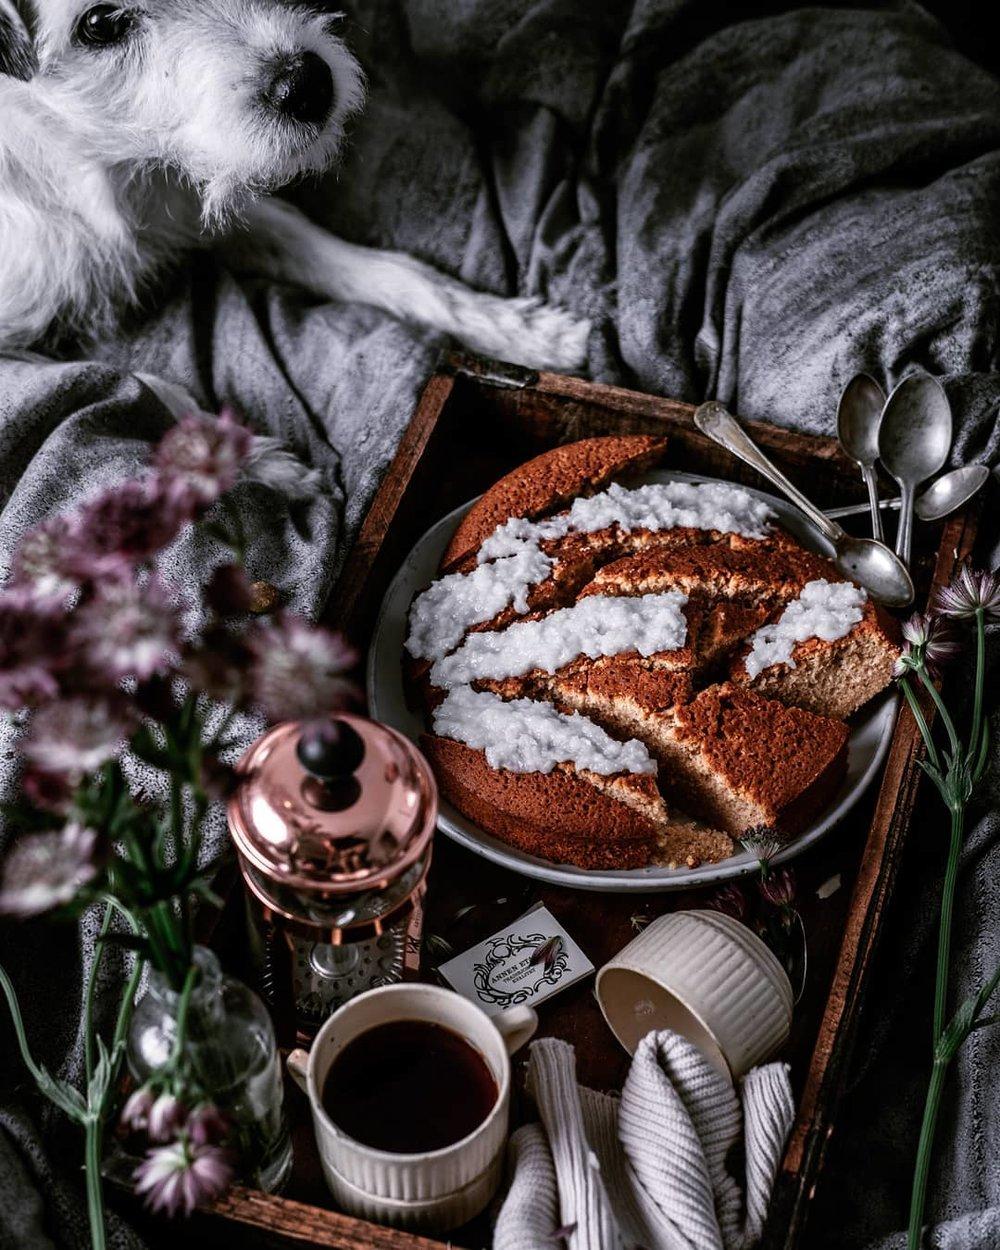 Kake pa senga med hund ludo fotografering oslo mats dreyer